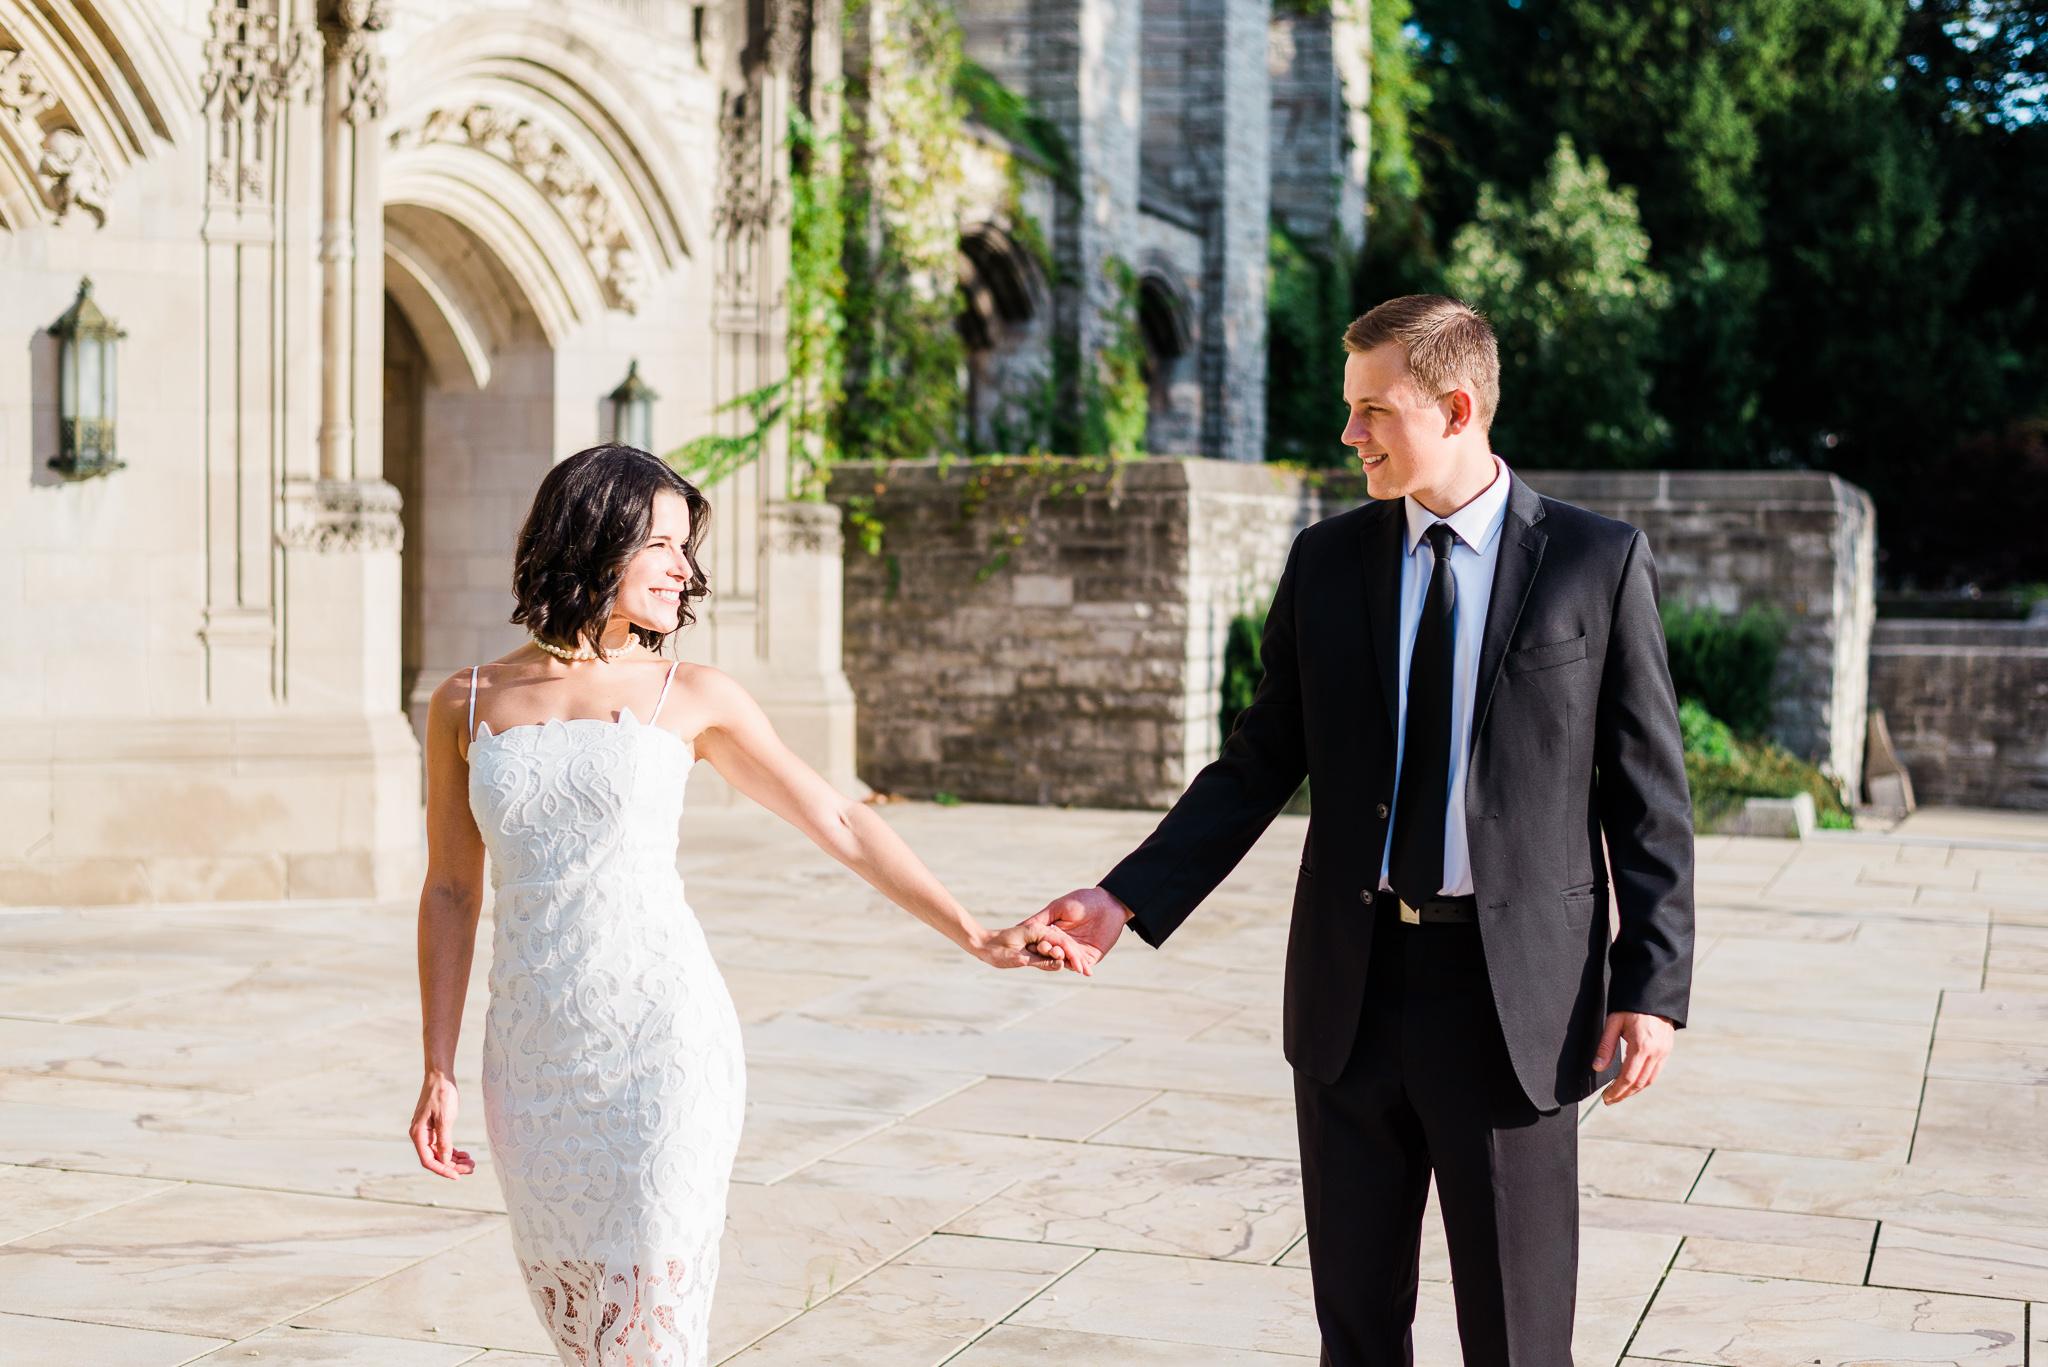 Elizabeth-Matt-Engagement-Northwestern-University-Evanston-IL-2020-188